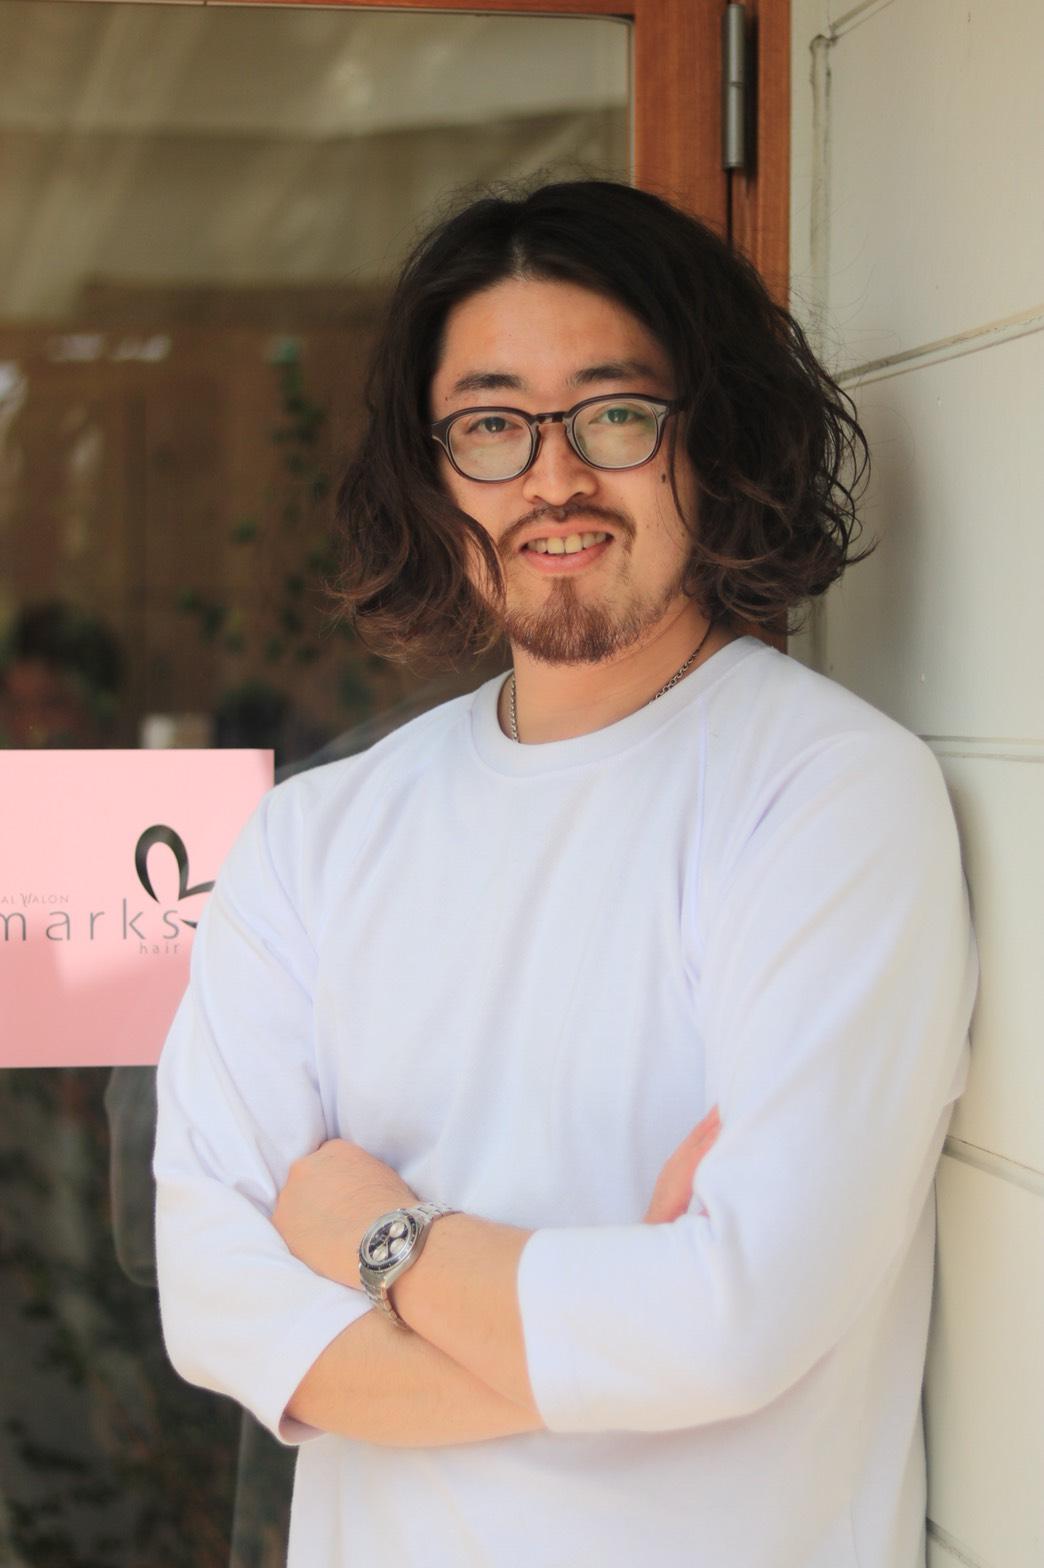 Masami Igarashi